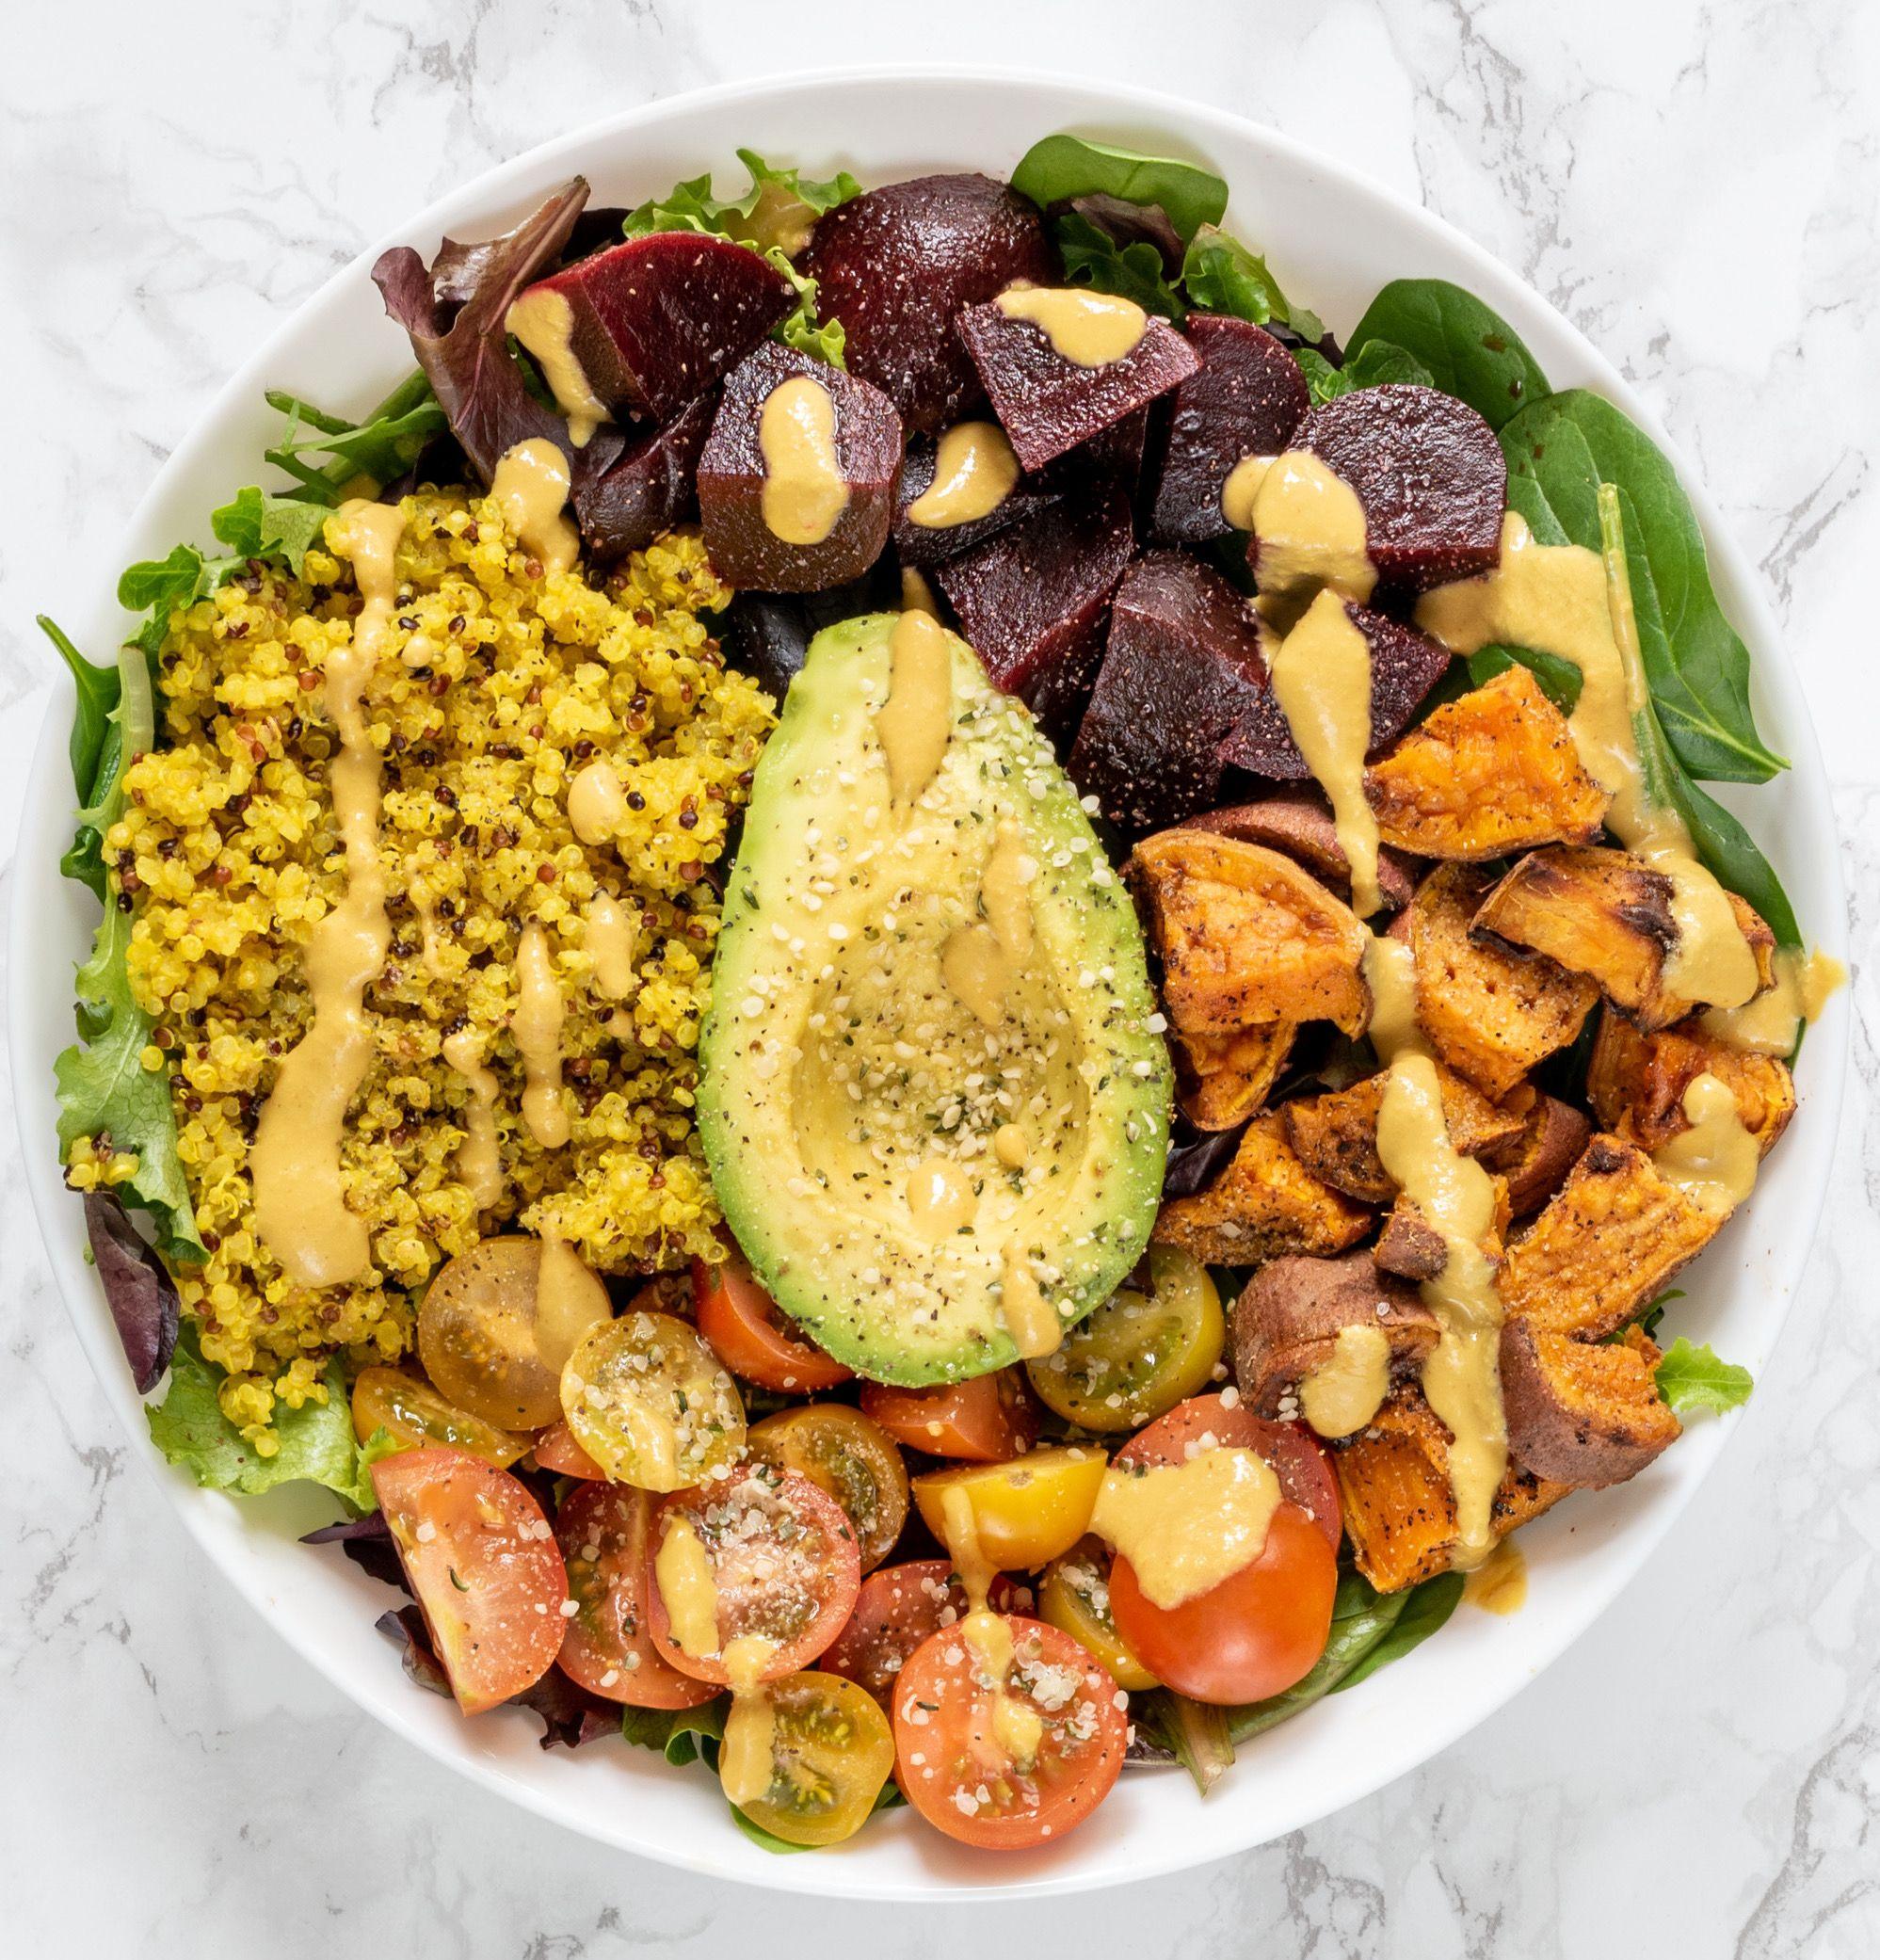 Vegan Power Bowl Gluten Free Oil Free Healthygirl Kitchen Recipe In 2020 Yummy Pasta Recipes Vegan Gluten Free Veggie Bowl